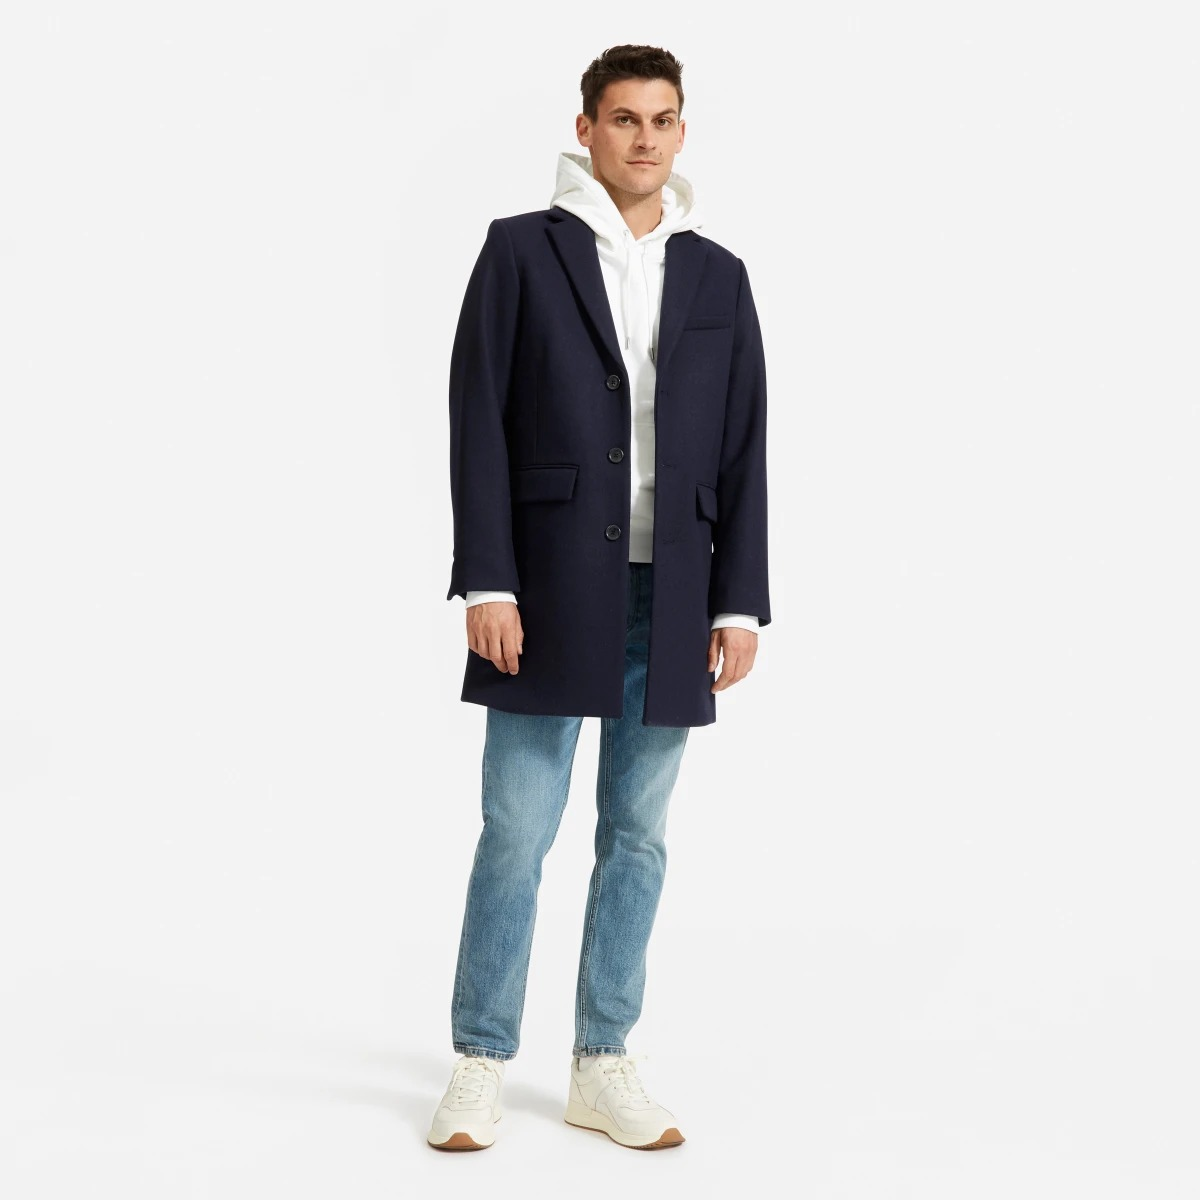 Everlane-The-ReWool-Overcoat